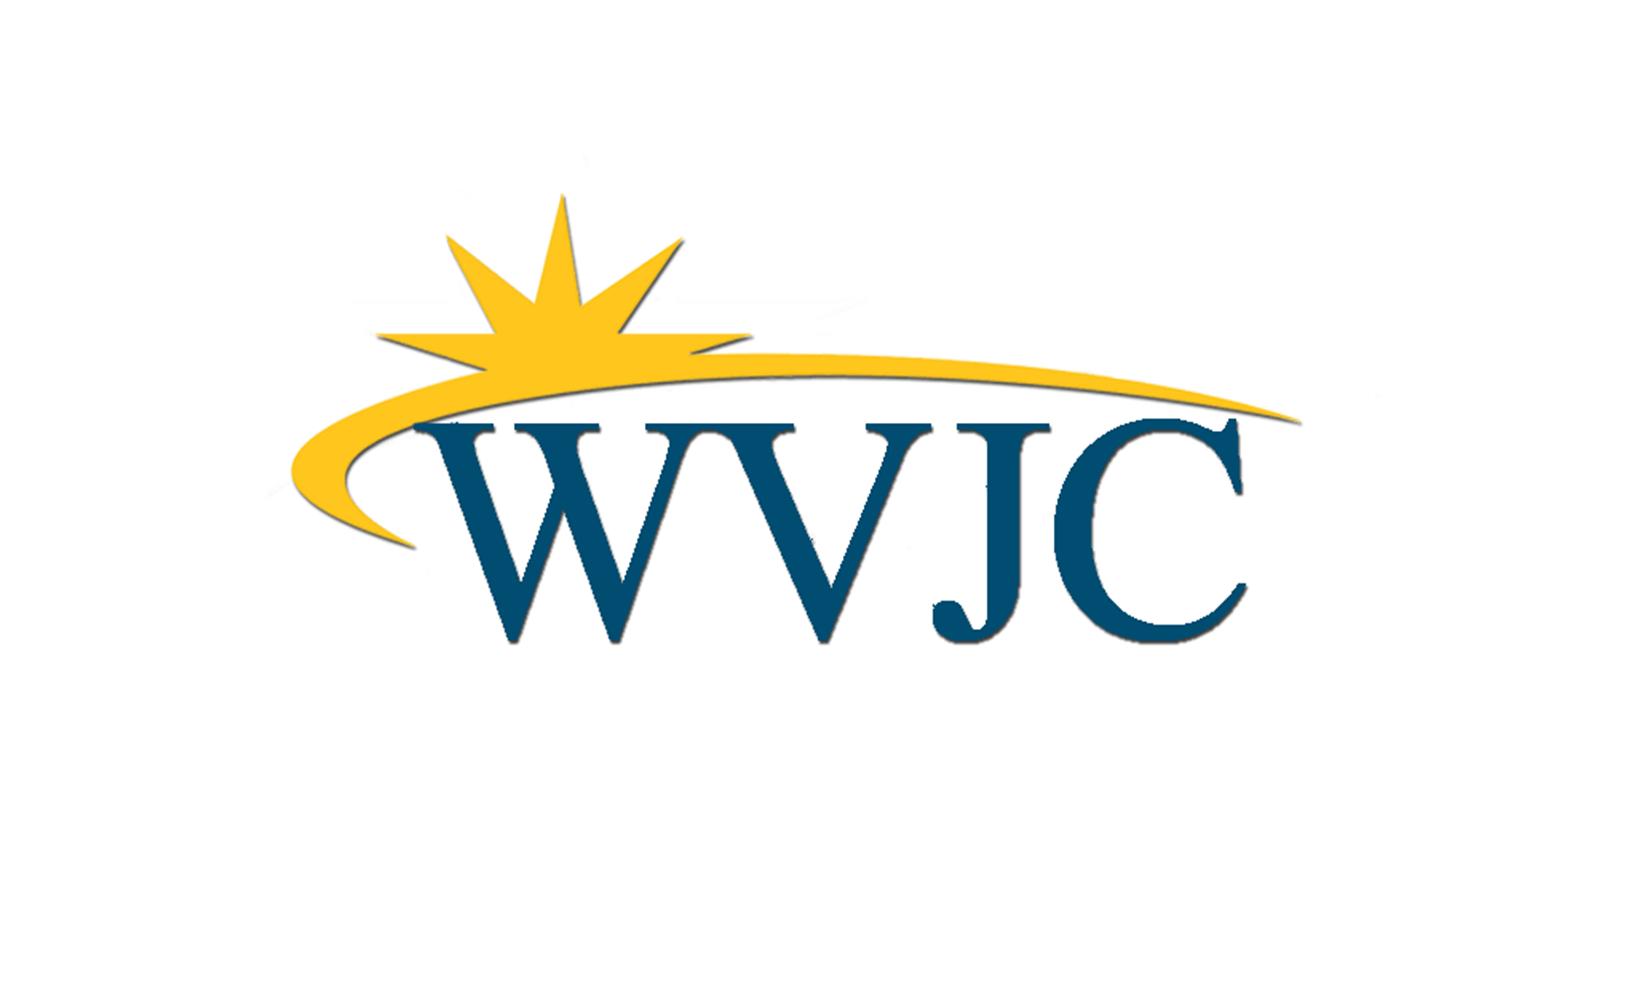 WVJC logo